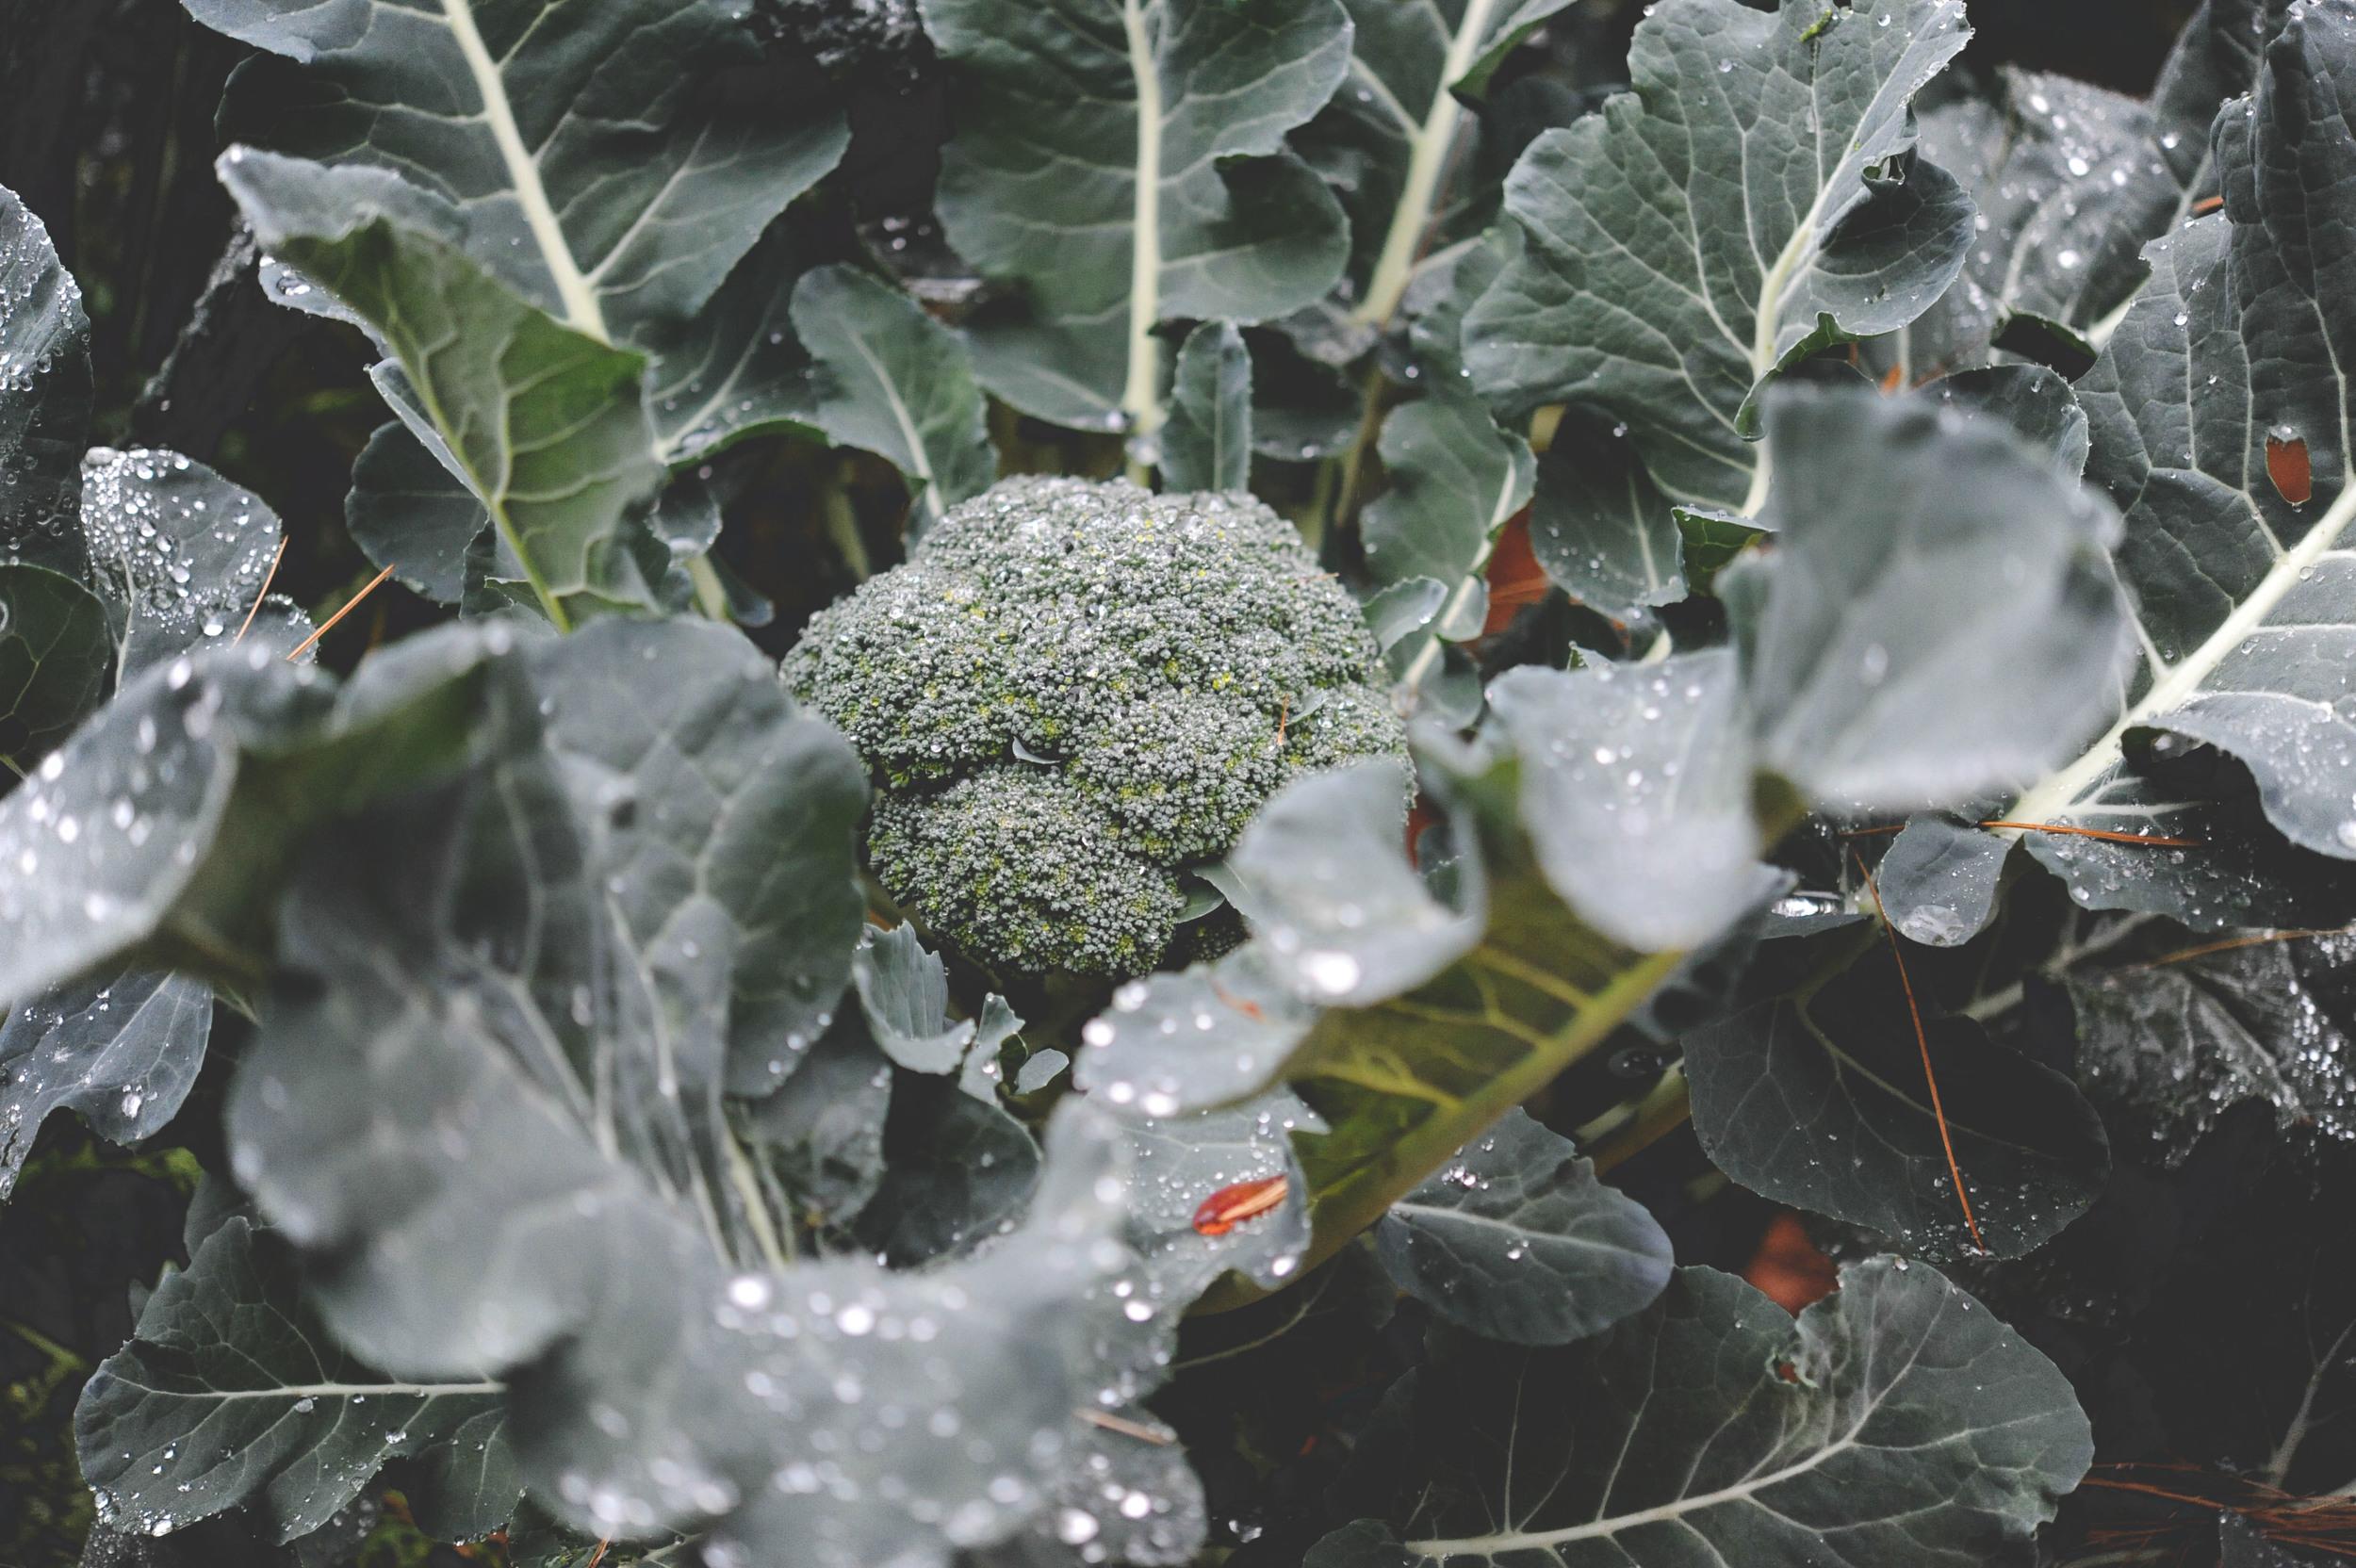 Bay Meadows Broccoli_Seattle Urban Farm Co.